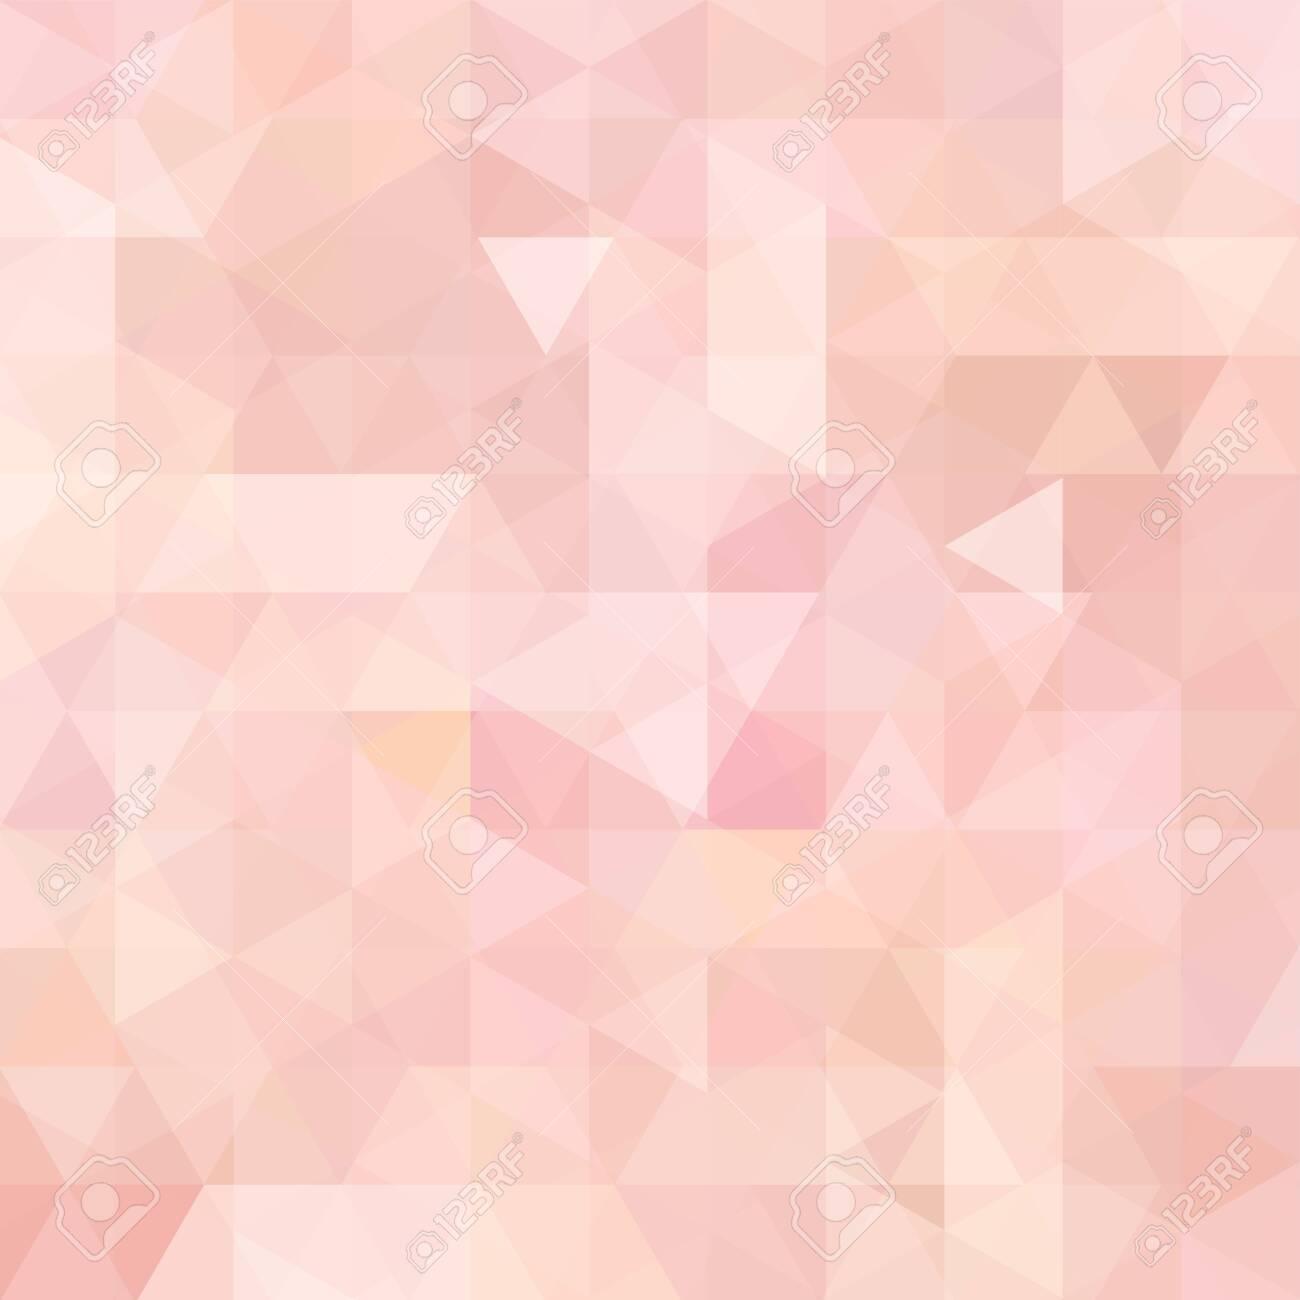 Geometric pattern, triangles vector background in pastel pink, orange ' tones. Illustration pattern - 138239474